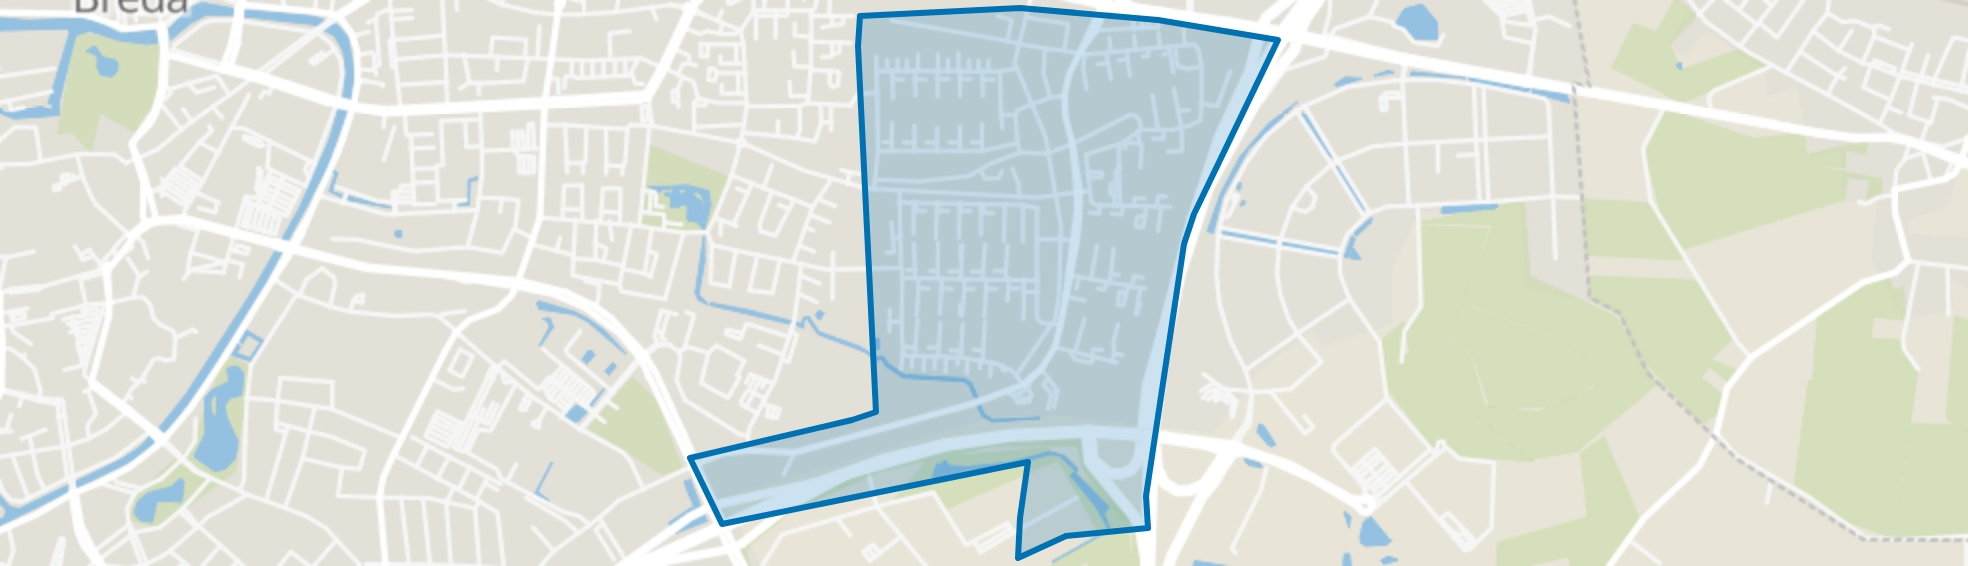 Heusdenhout, Breda map